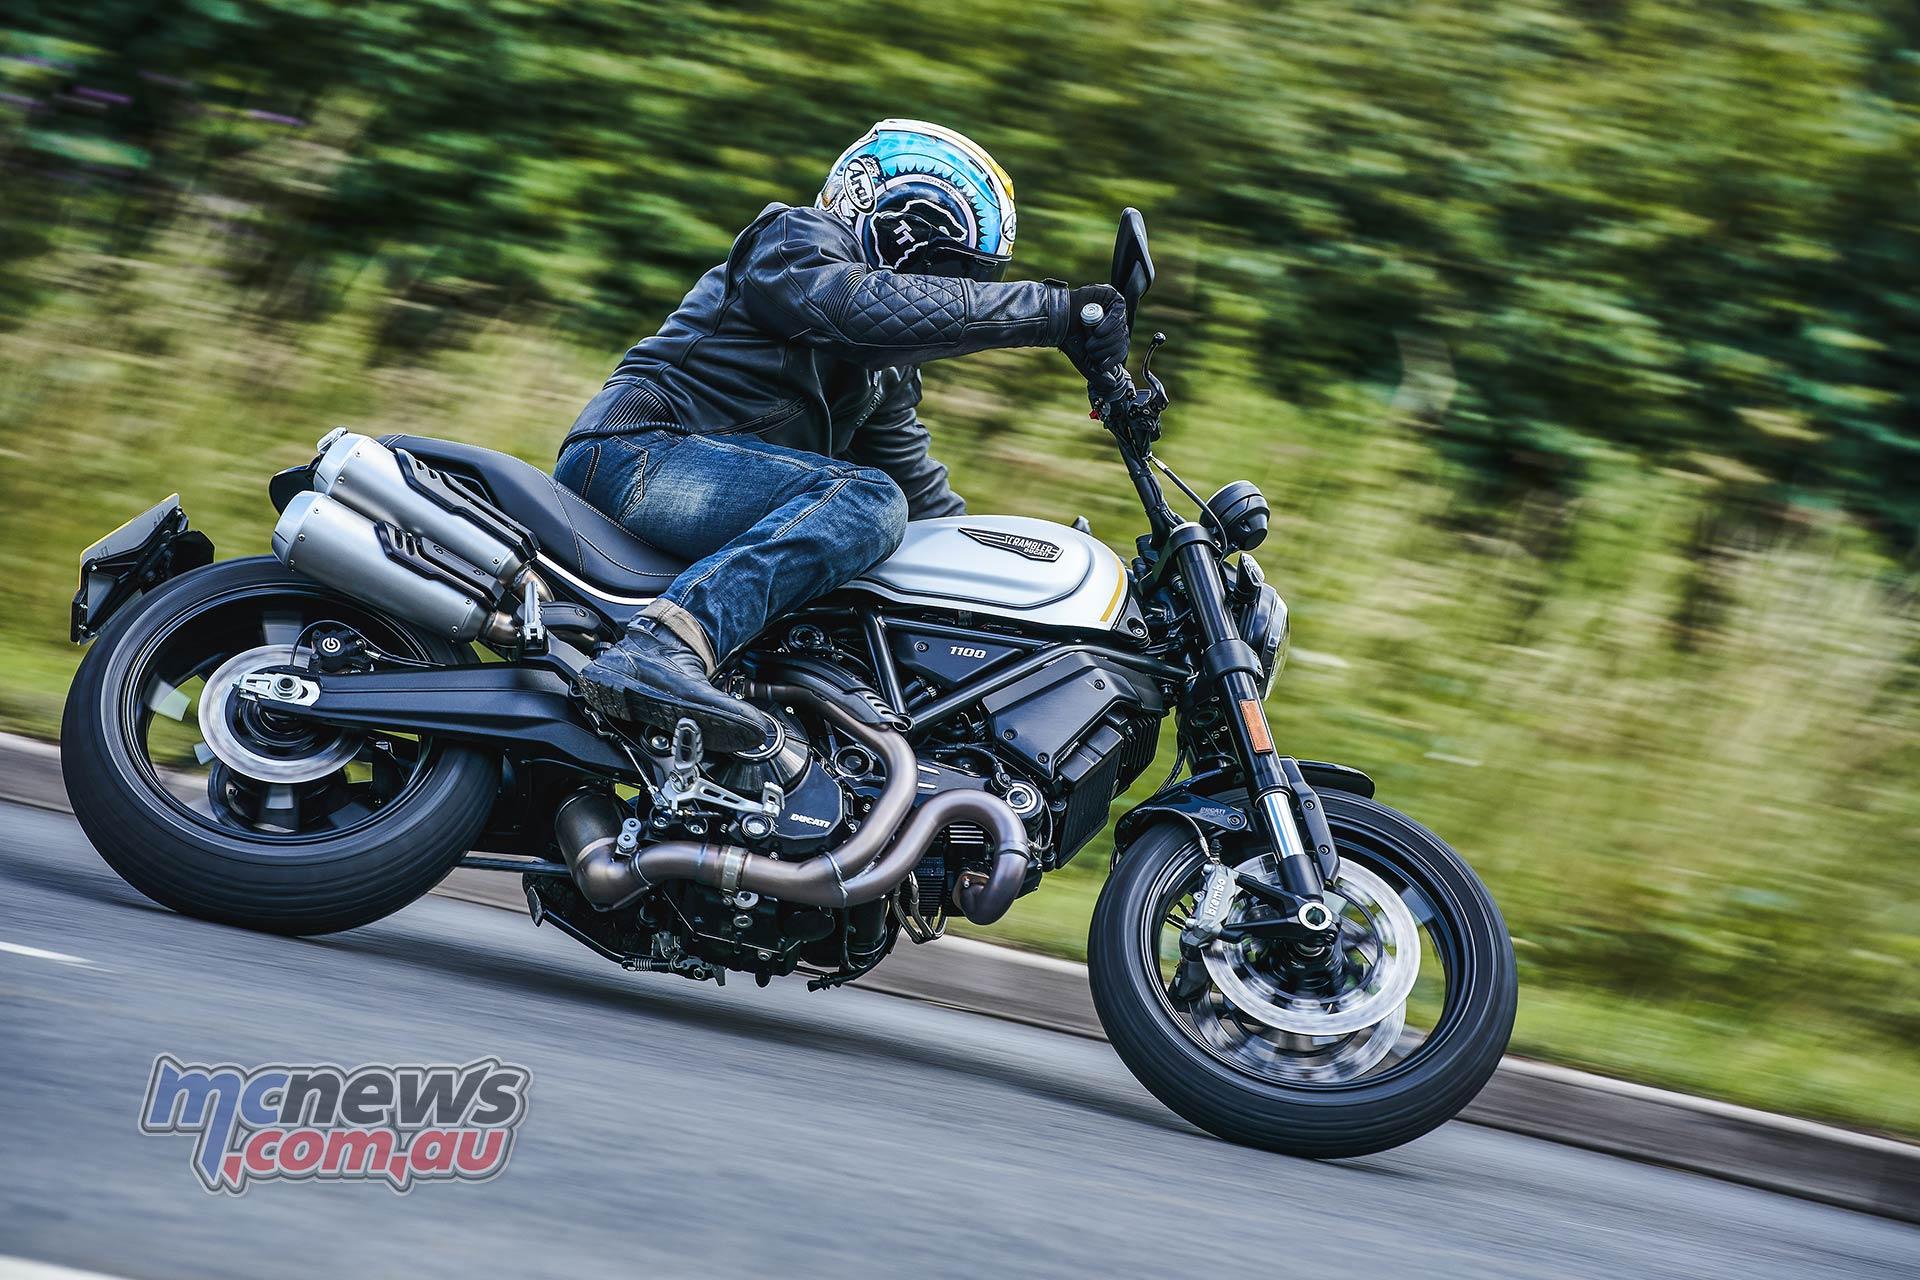 2021 Ducati Scrambler 1100 Pro has higher handlebars than the Sport Pro